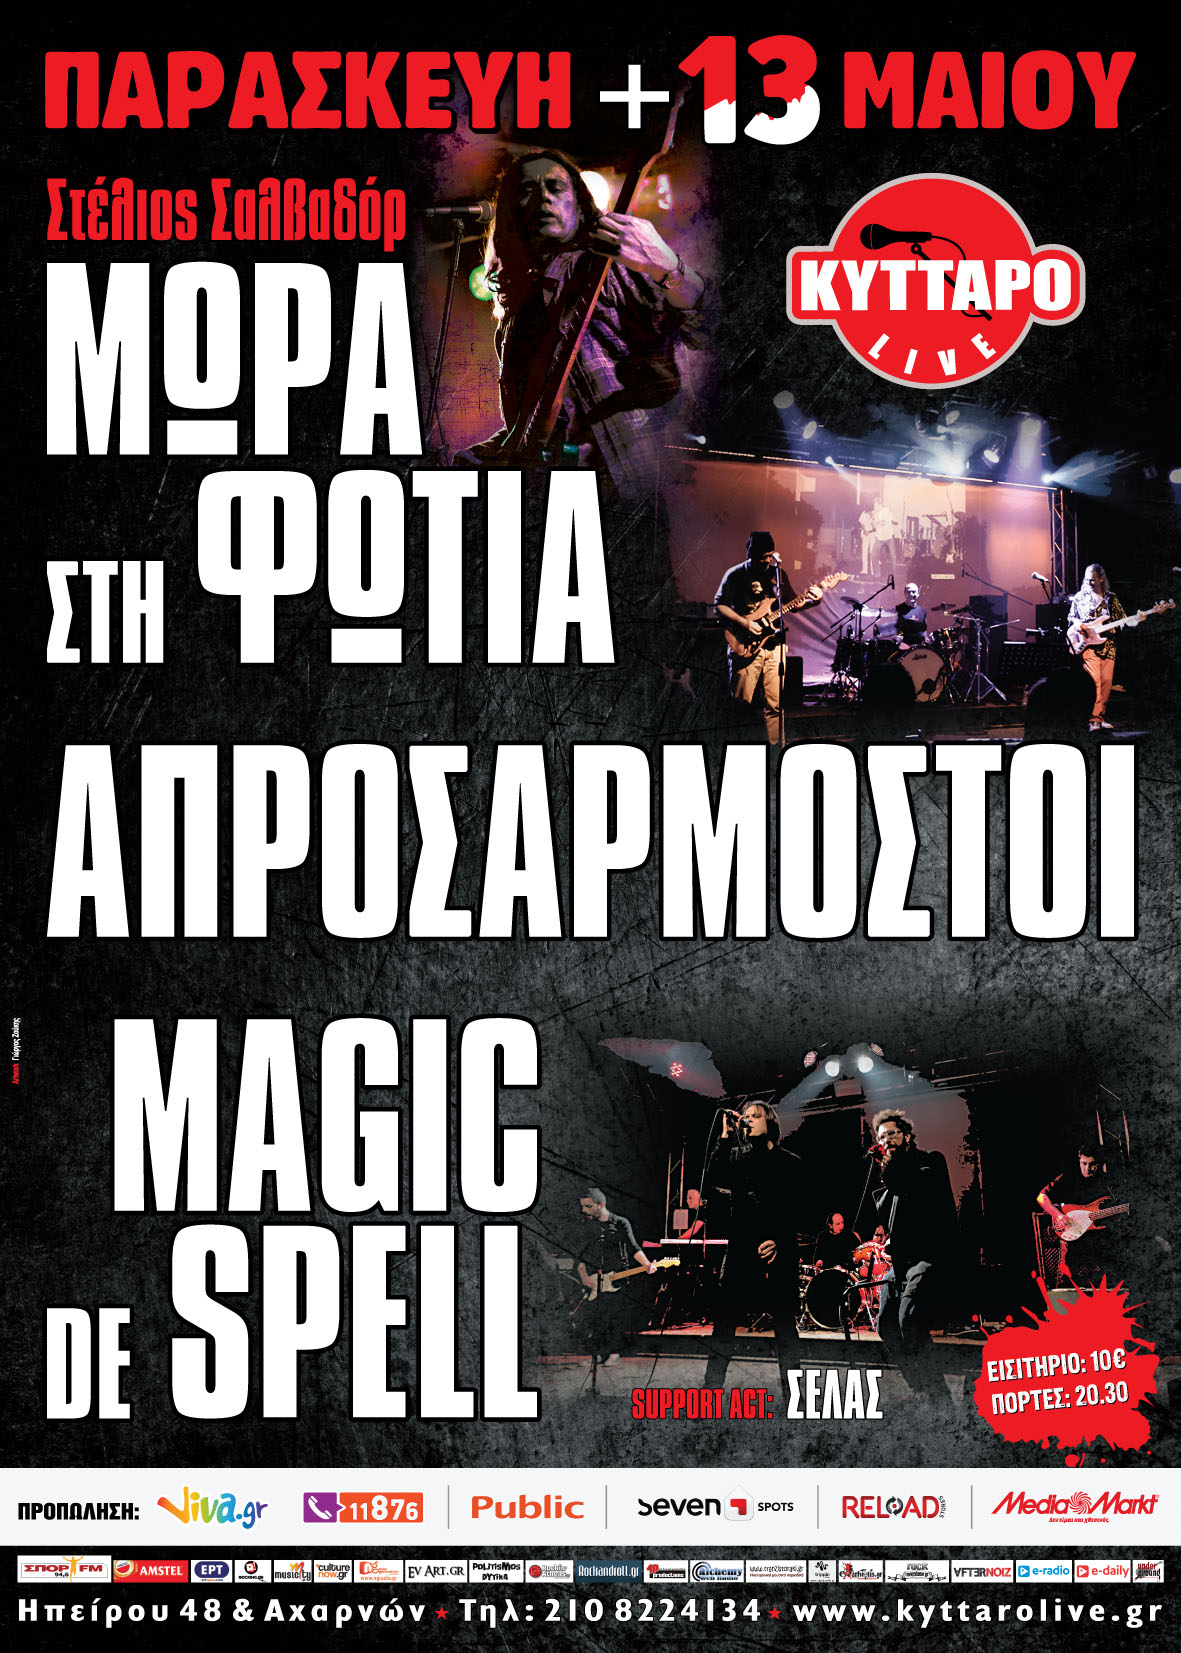 Kyttaro live 13 May.cdr